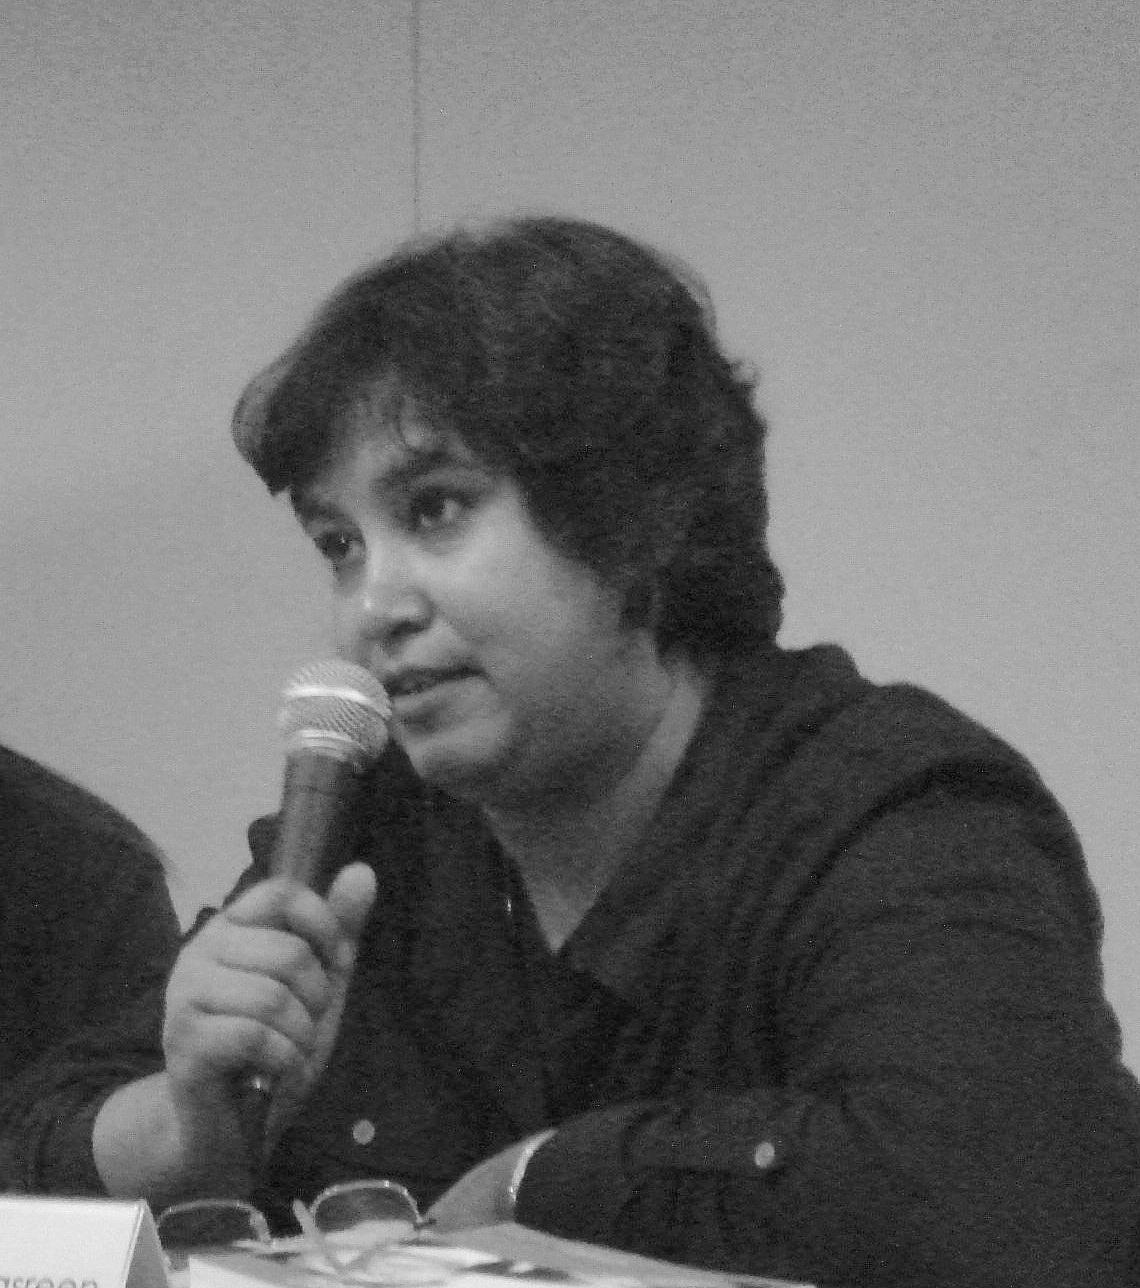 taslima nasreen Taslima nasrin's biography and life storytaslima nasrin (bengali: তসলিমা নাসরিন, arabic: تسليمة نسرین, hindi: तसलीमा नसरीन, toslima nasrin) is a bangladeshi author and former physician who has been living in ex.